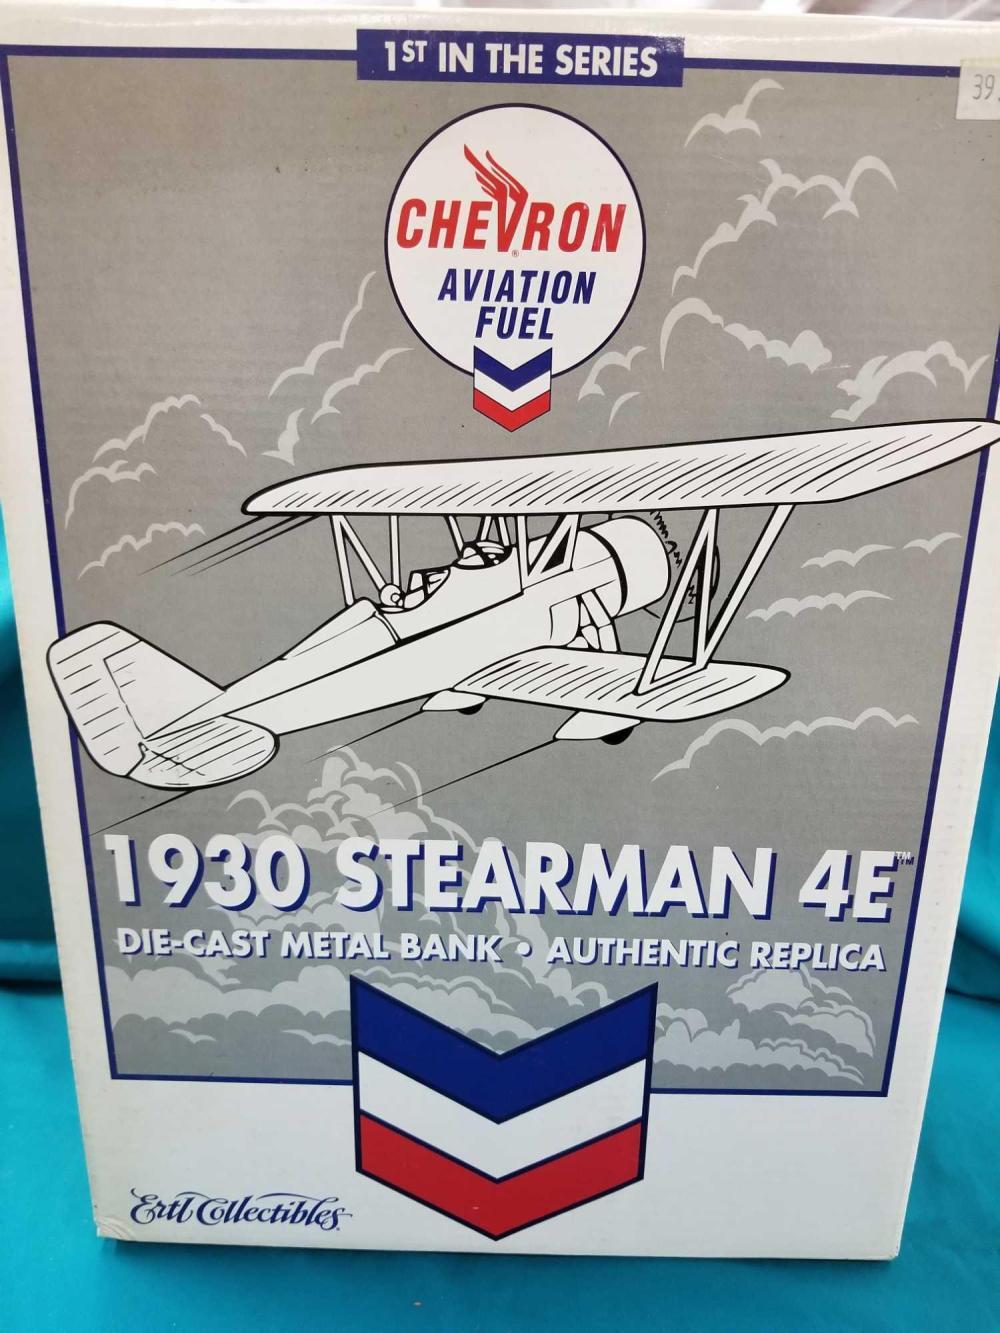 CHEVRON AVIATION FUELS 1930 STEARMAN 4E DIE CAST METAL AIRPLANE BANK IN THE BOX